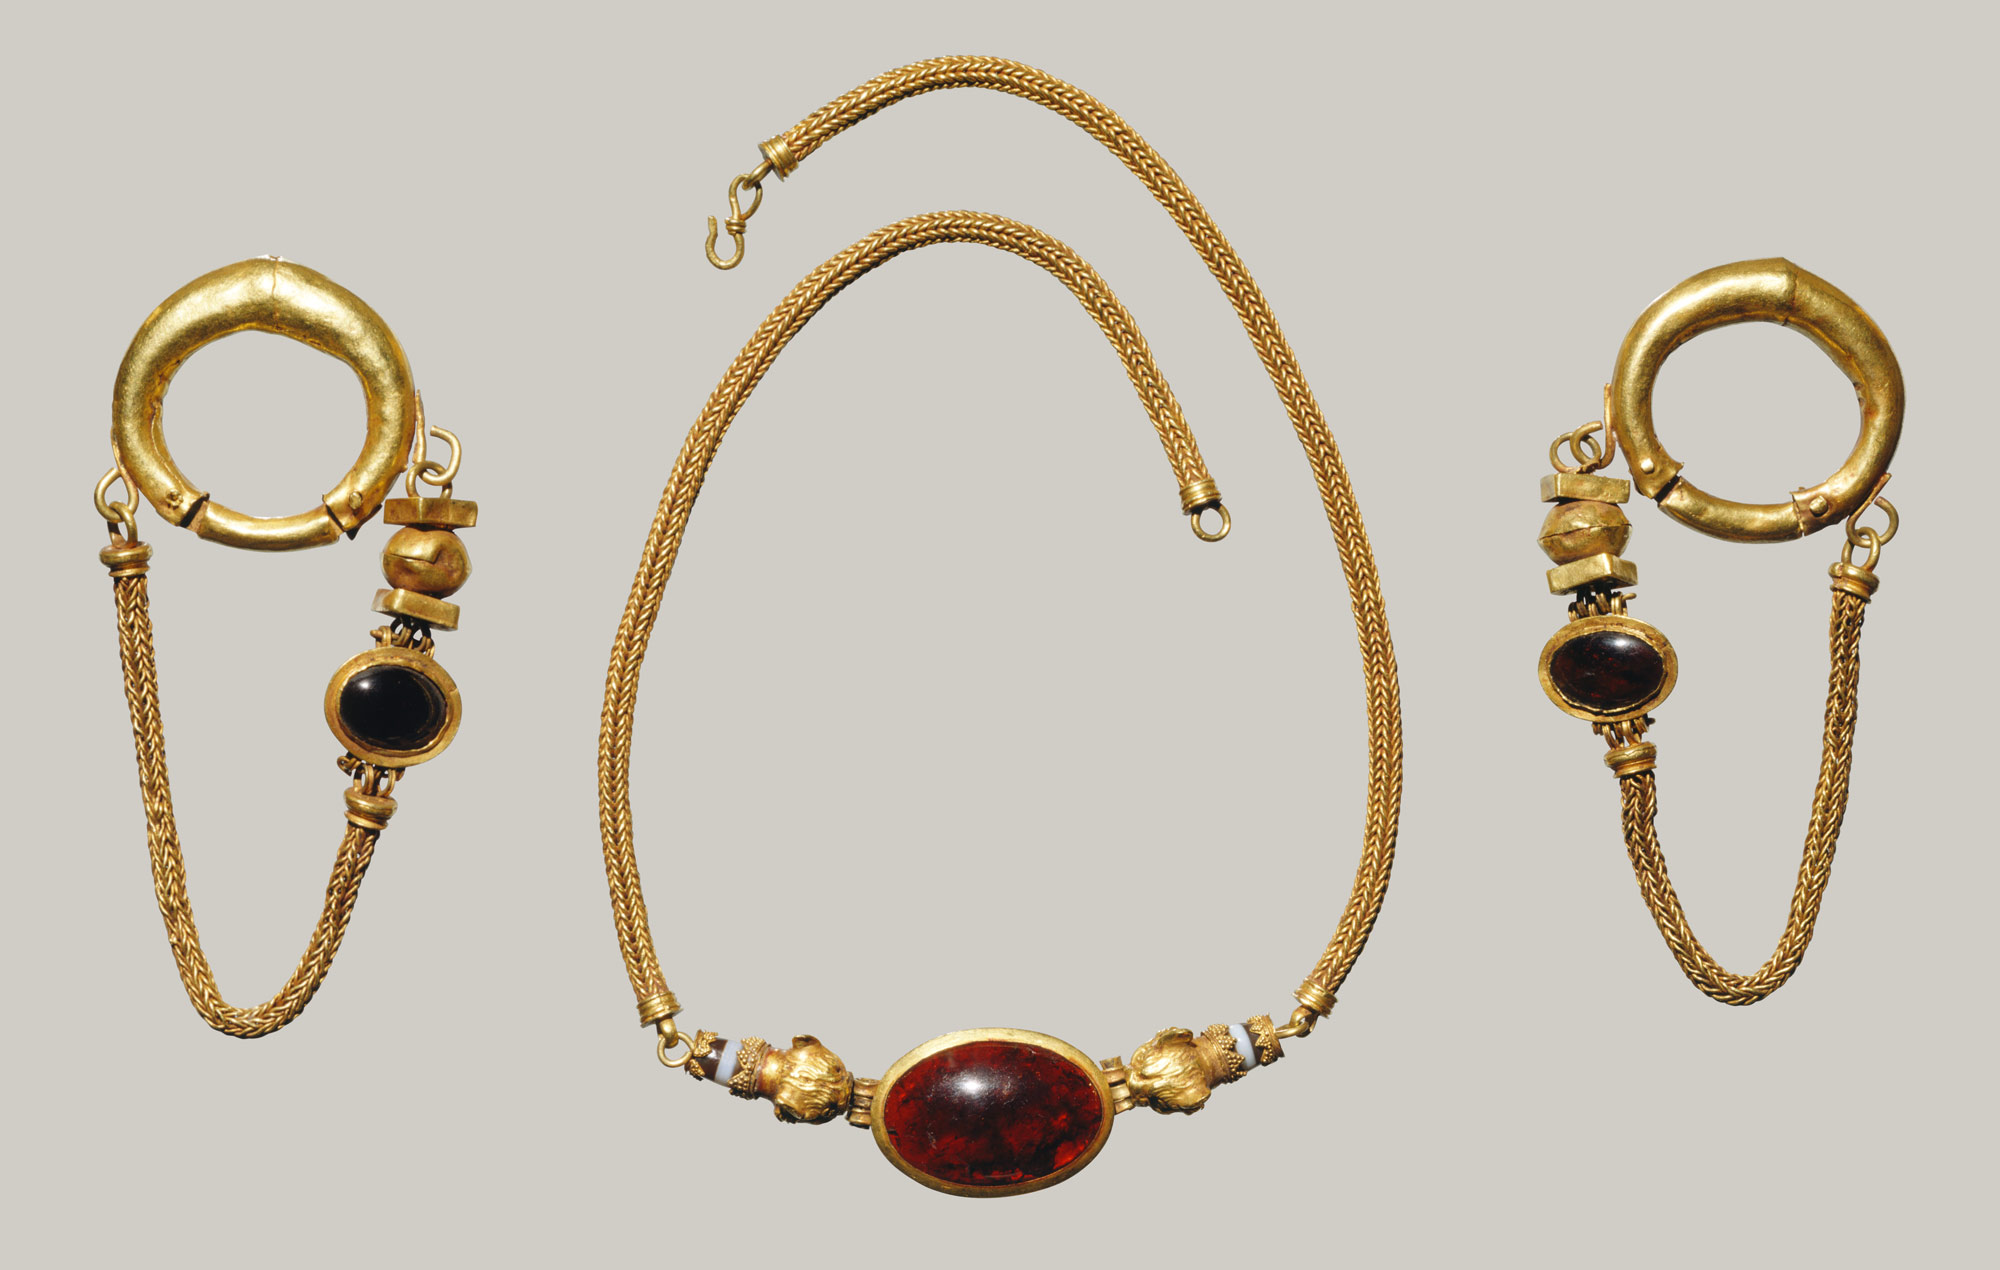 Jewellery & Watches Costume Jewellery Bracelet Earrings Necklace Mae From Vintage Jewellery